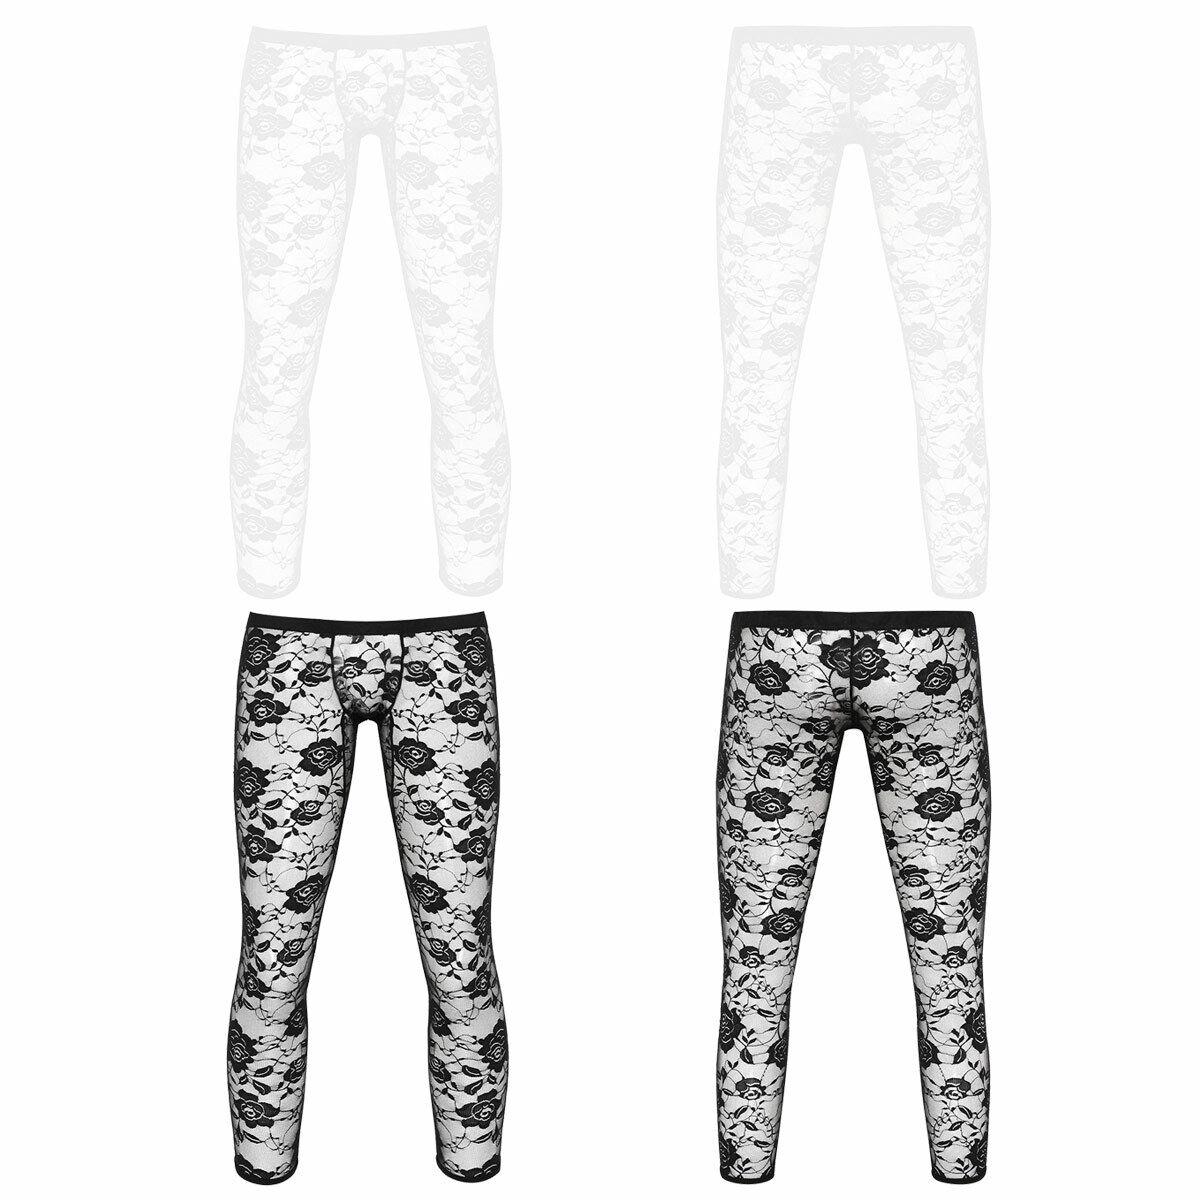 Mens Sissy Floral Lace Sheer Mesh Long Pants Leggings Low Rise Semi See Through Transparent Long Johns Tights